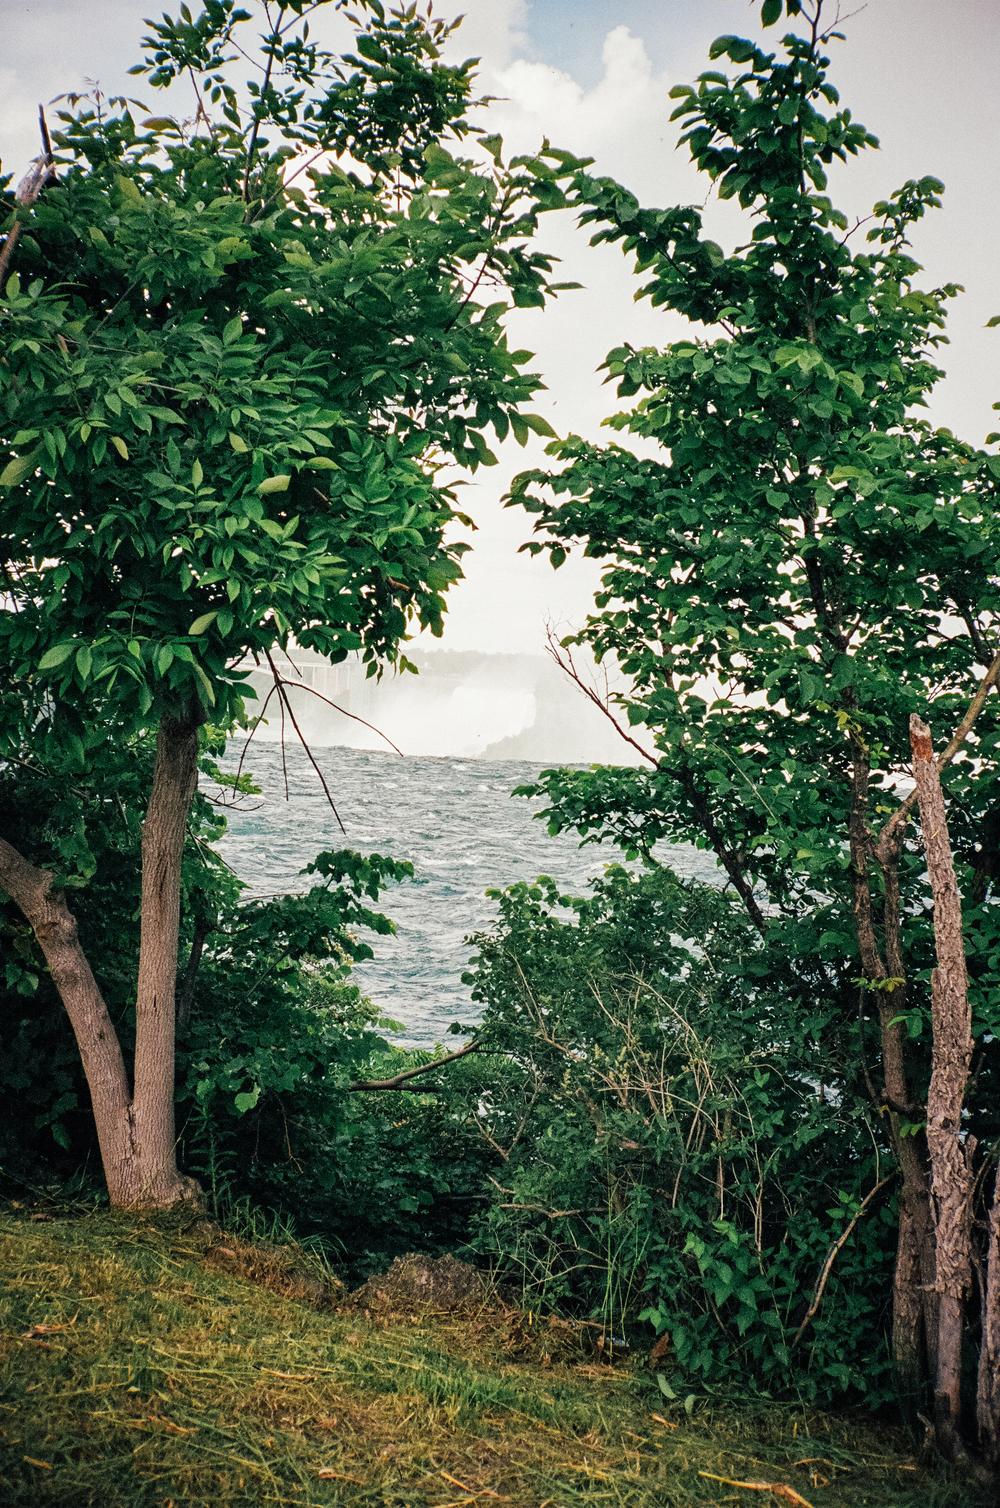 FILM_carlyfoulkes-00300032.jpg